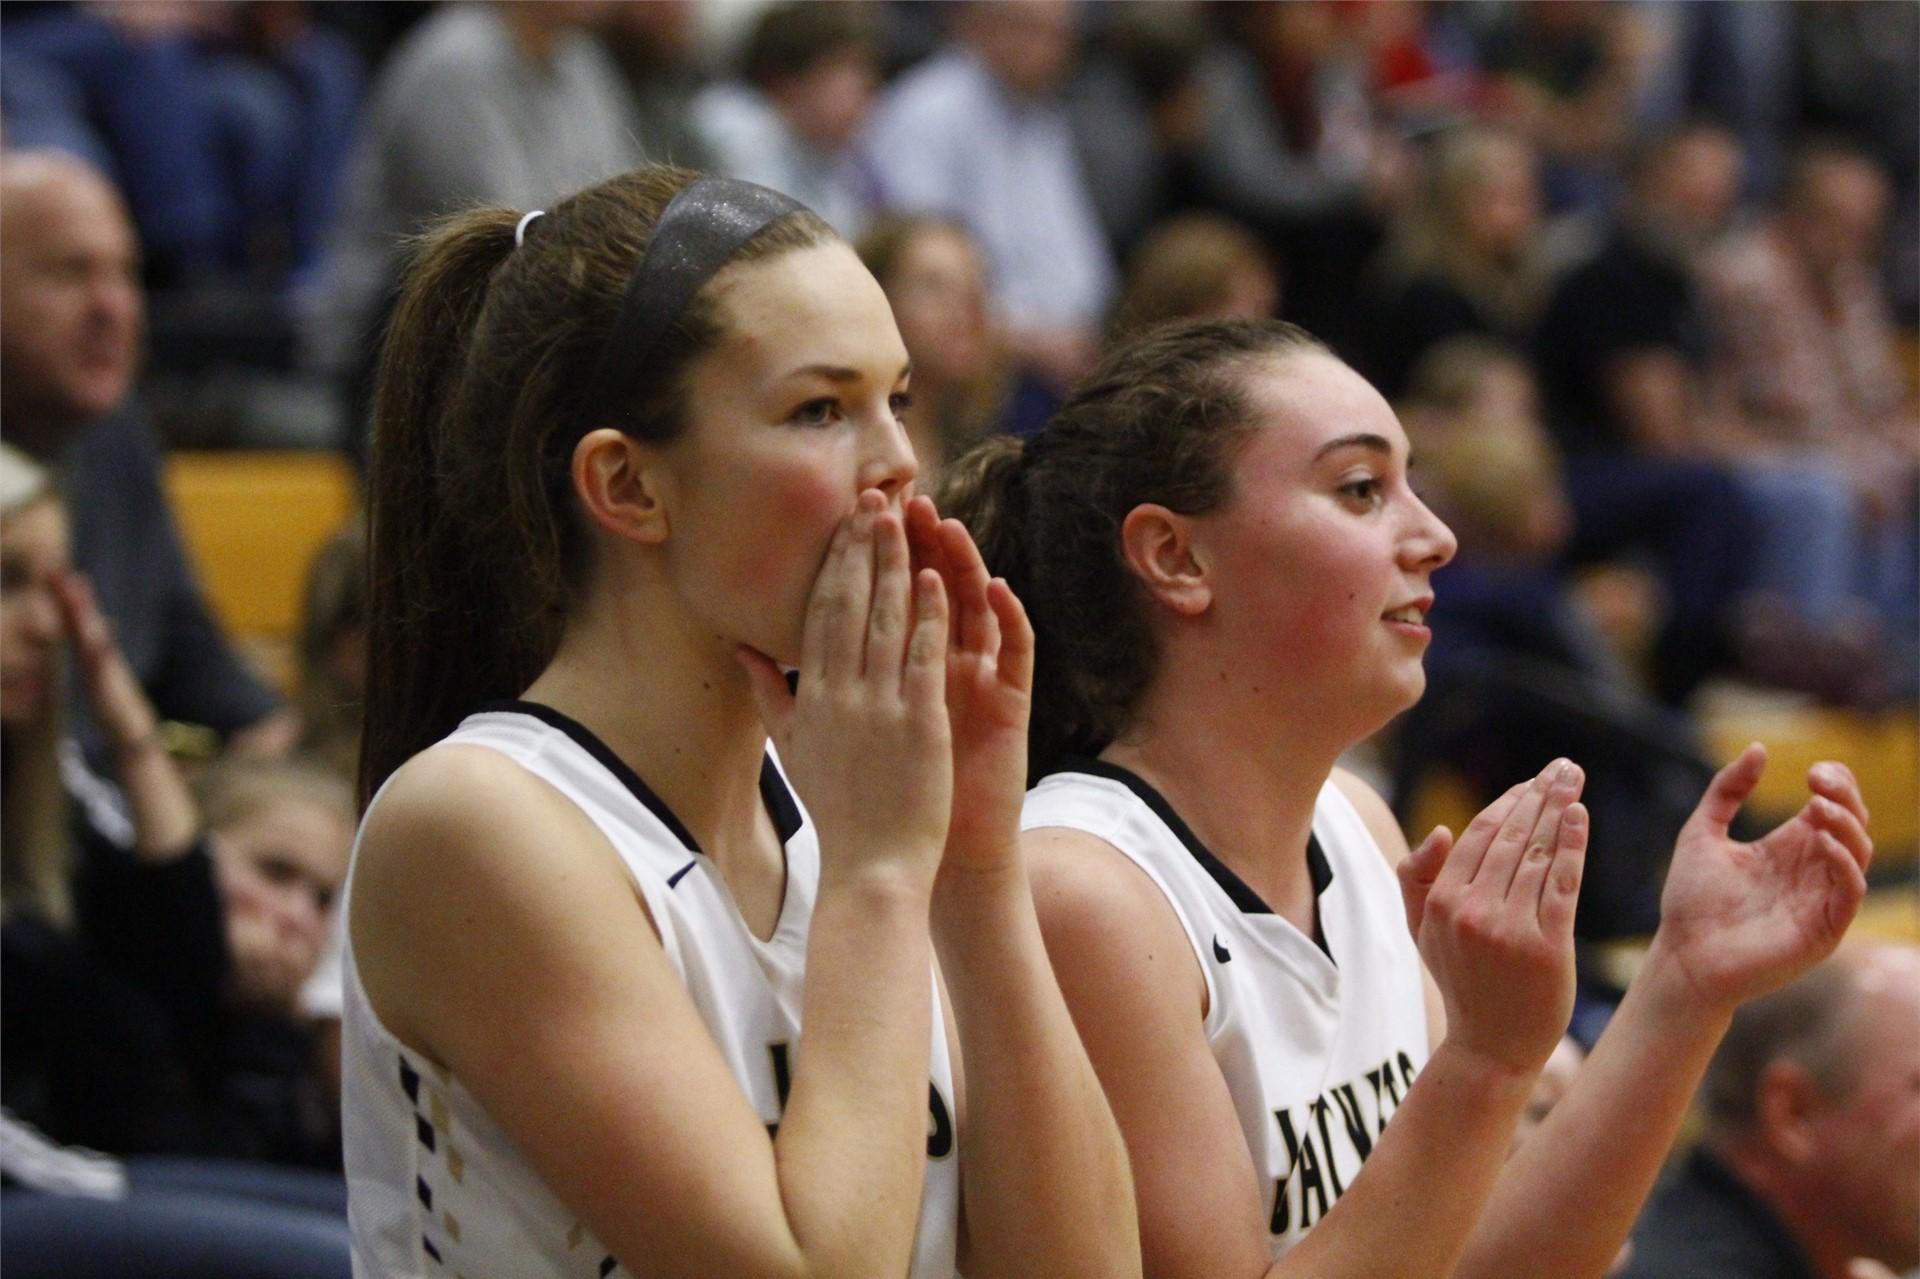 PHS student athletes cheering on their teammates